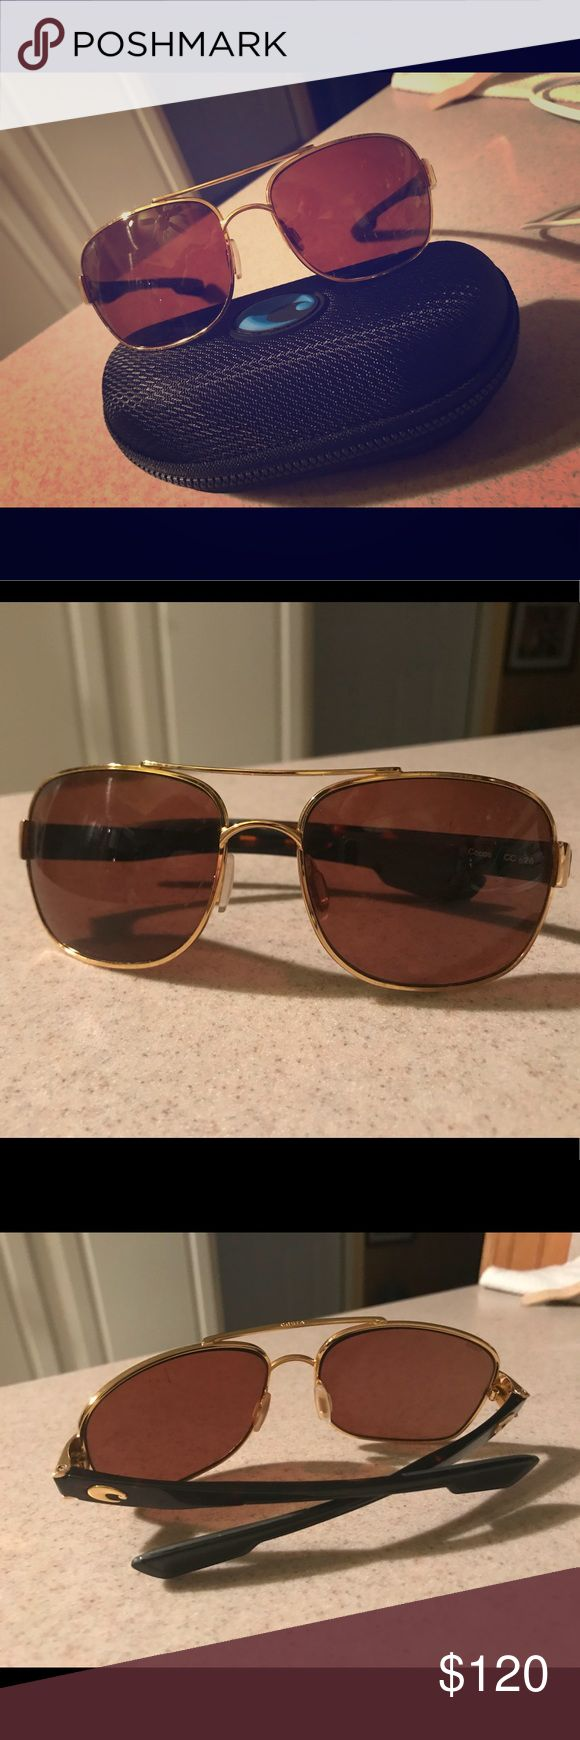 Costa Del Mar - Cocos Great polarized Costa sunglasses. Gold frame with amber lenses. Lightly worn. costa del mar Accessories Sunglasses